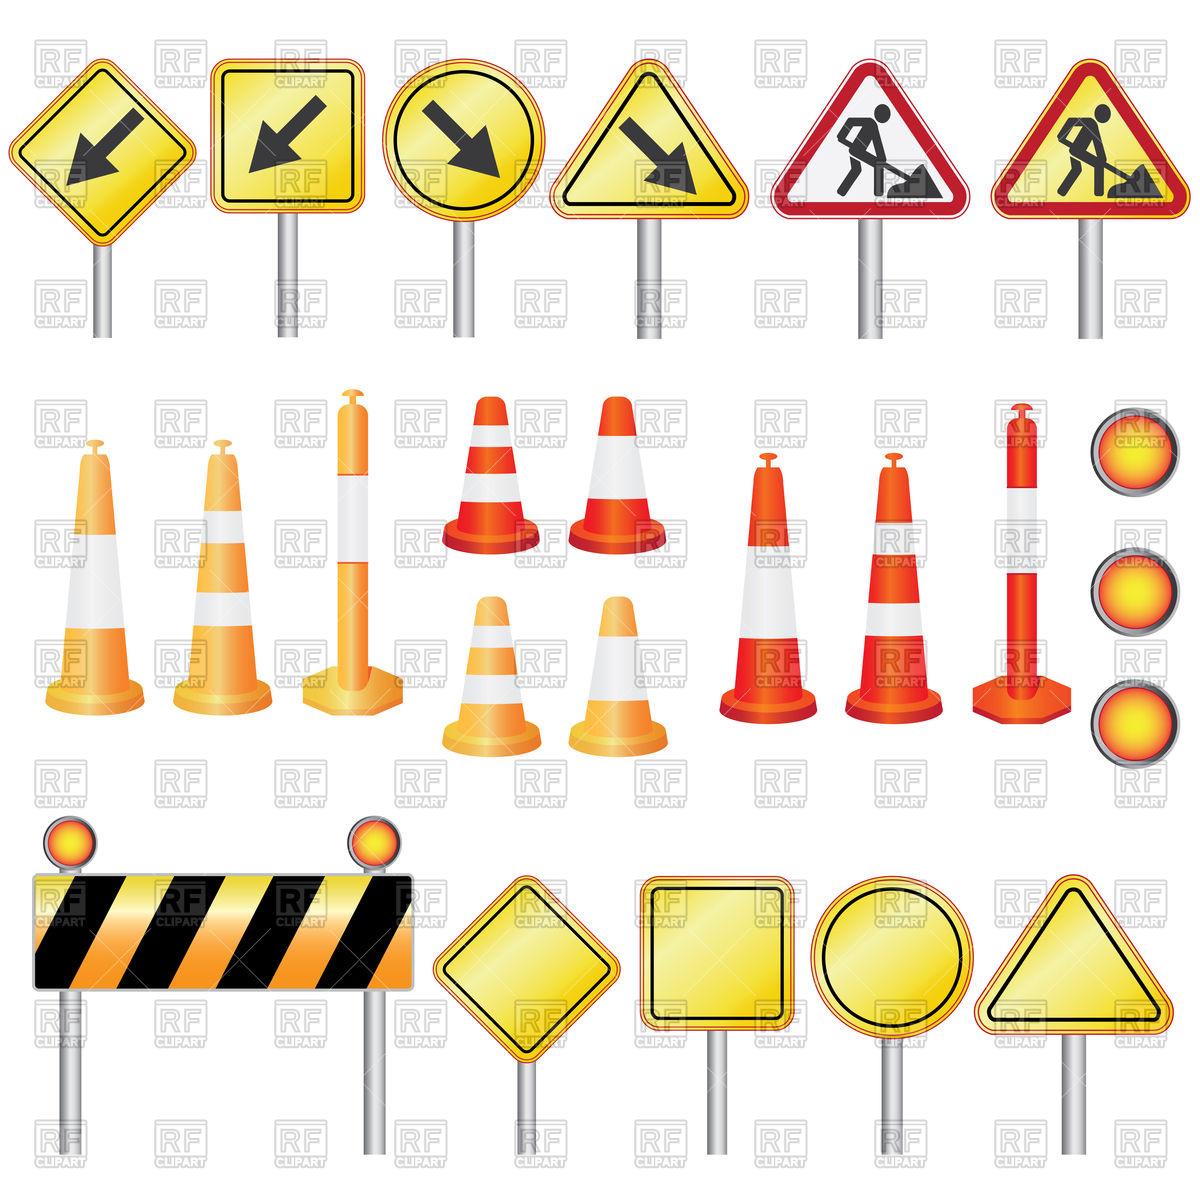 Traffic equipment for road work.